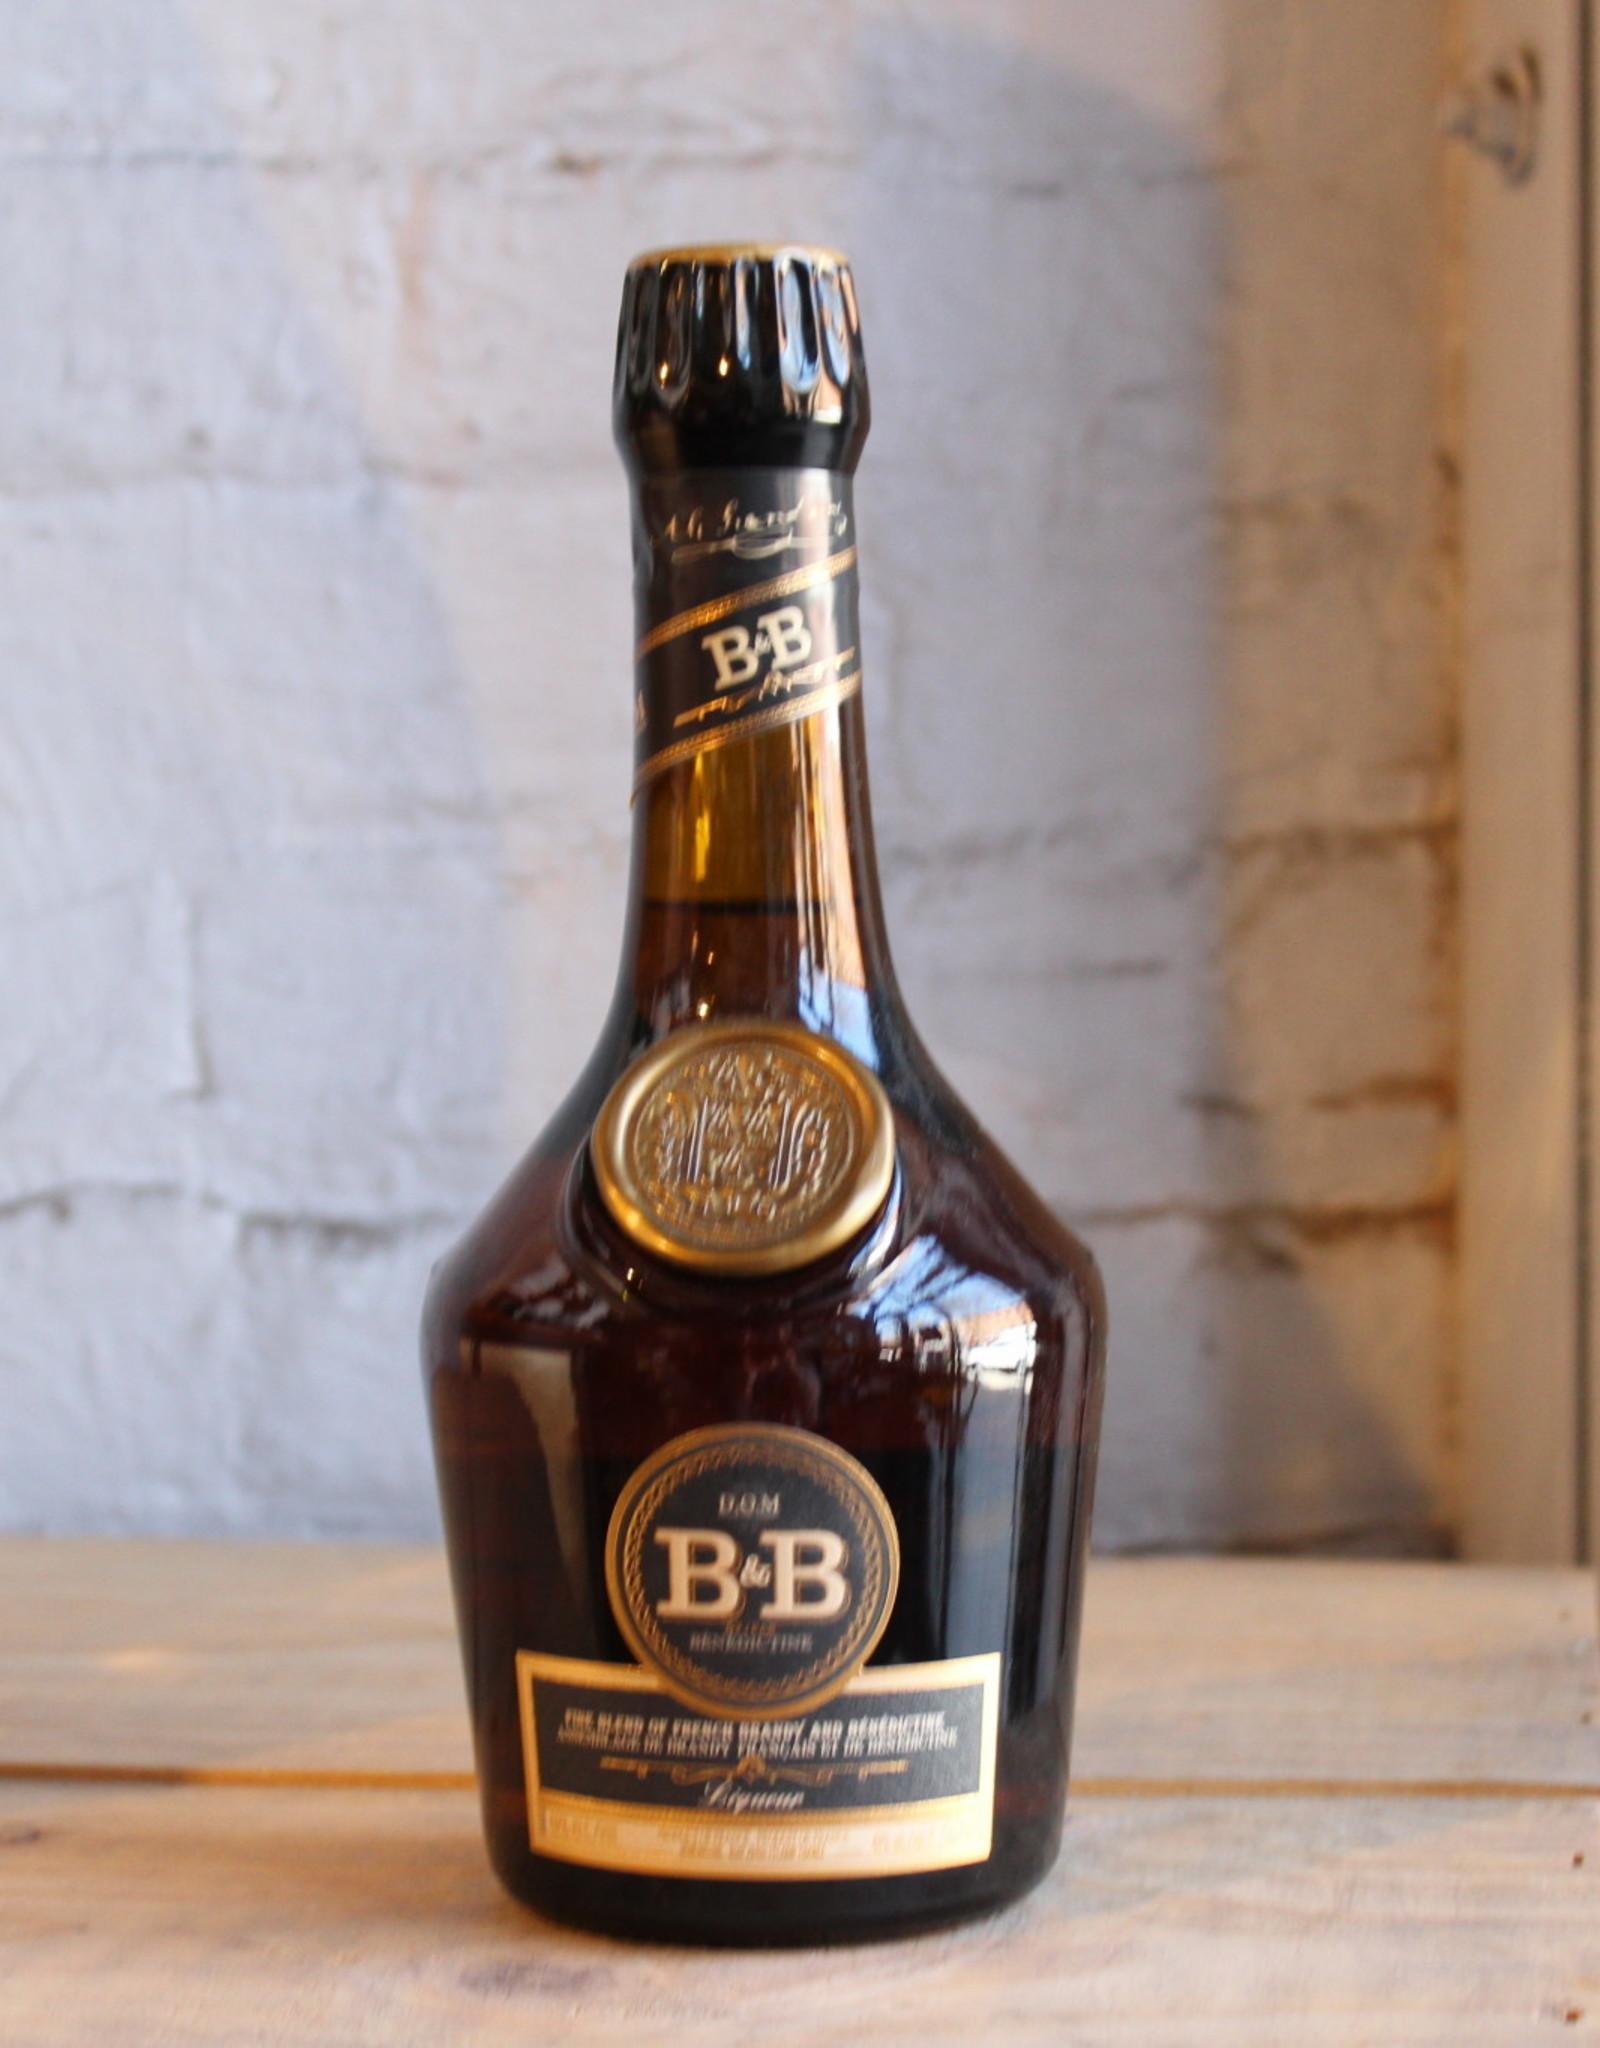 D.O.M. B&B Benedictine and Brandy - France (375ml)